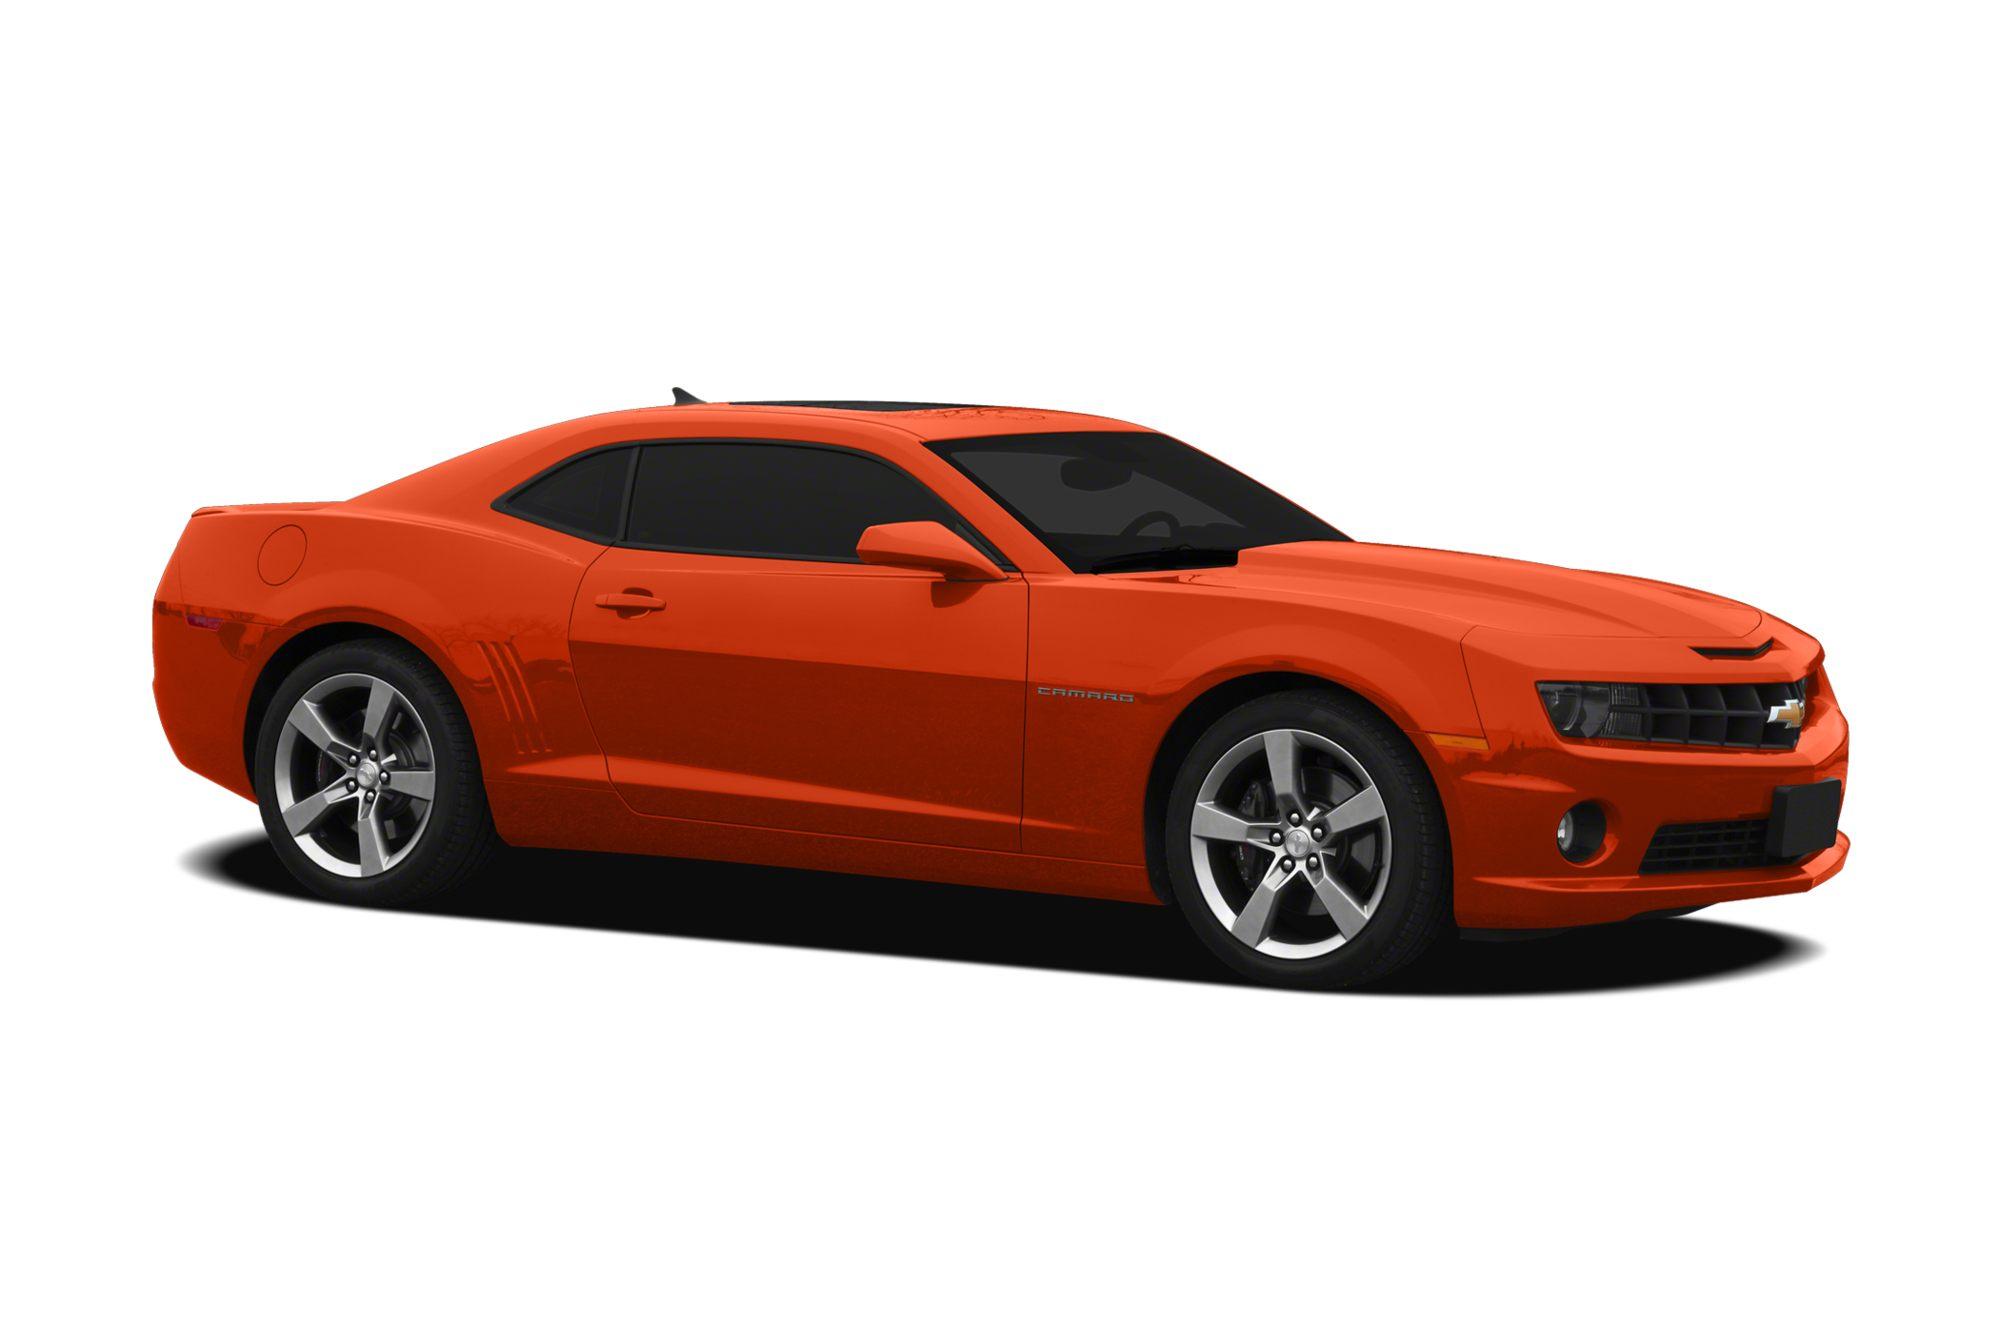 2010-2015 Chevrolet Camaro: Recall Alert